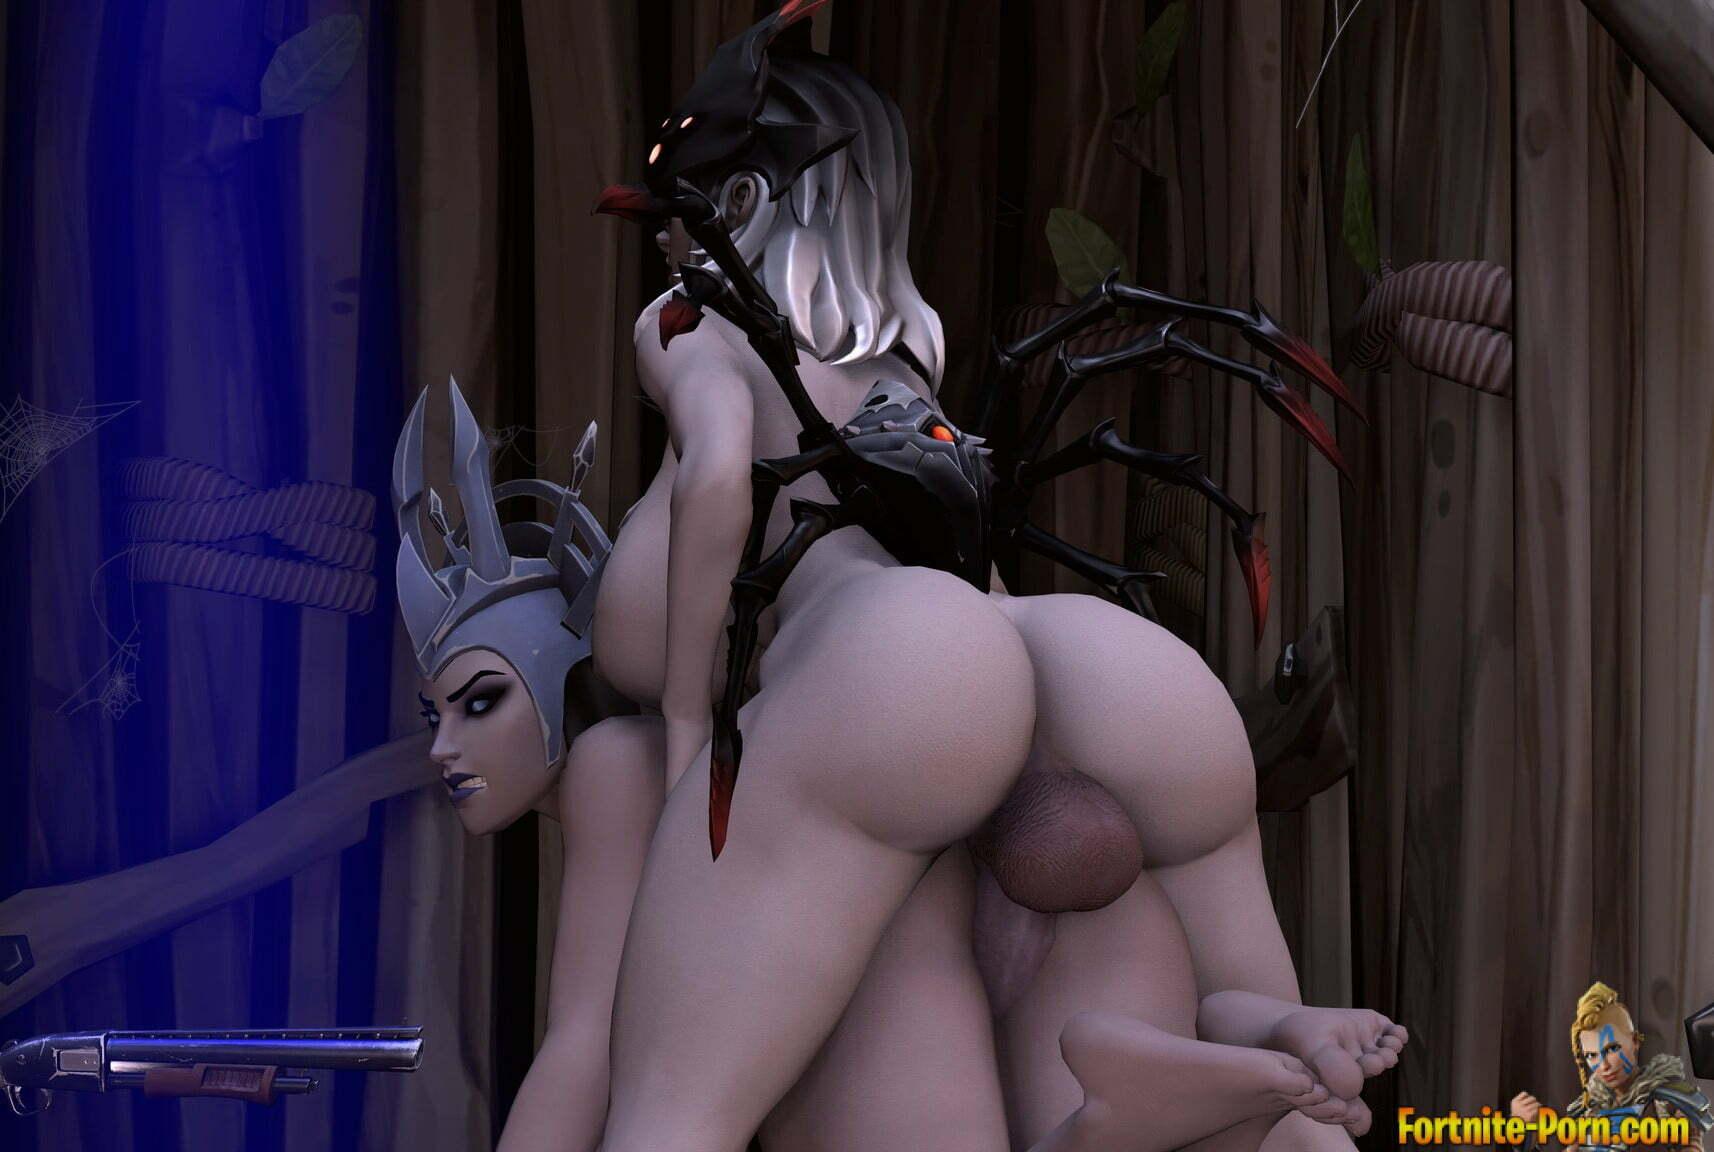 oblivion futa porn futa arachne fucking ice queen jpeg 1714x1152 - oblivion fortnite porn